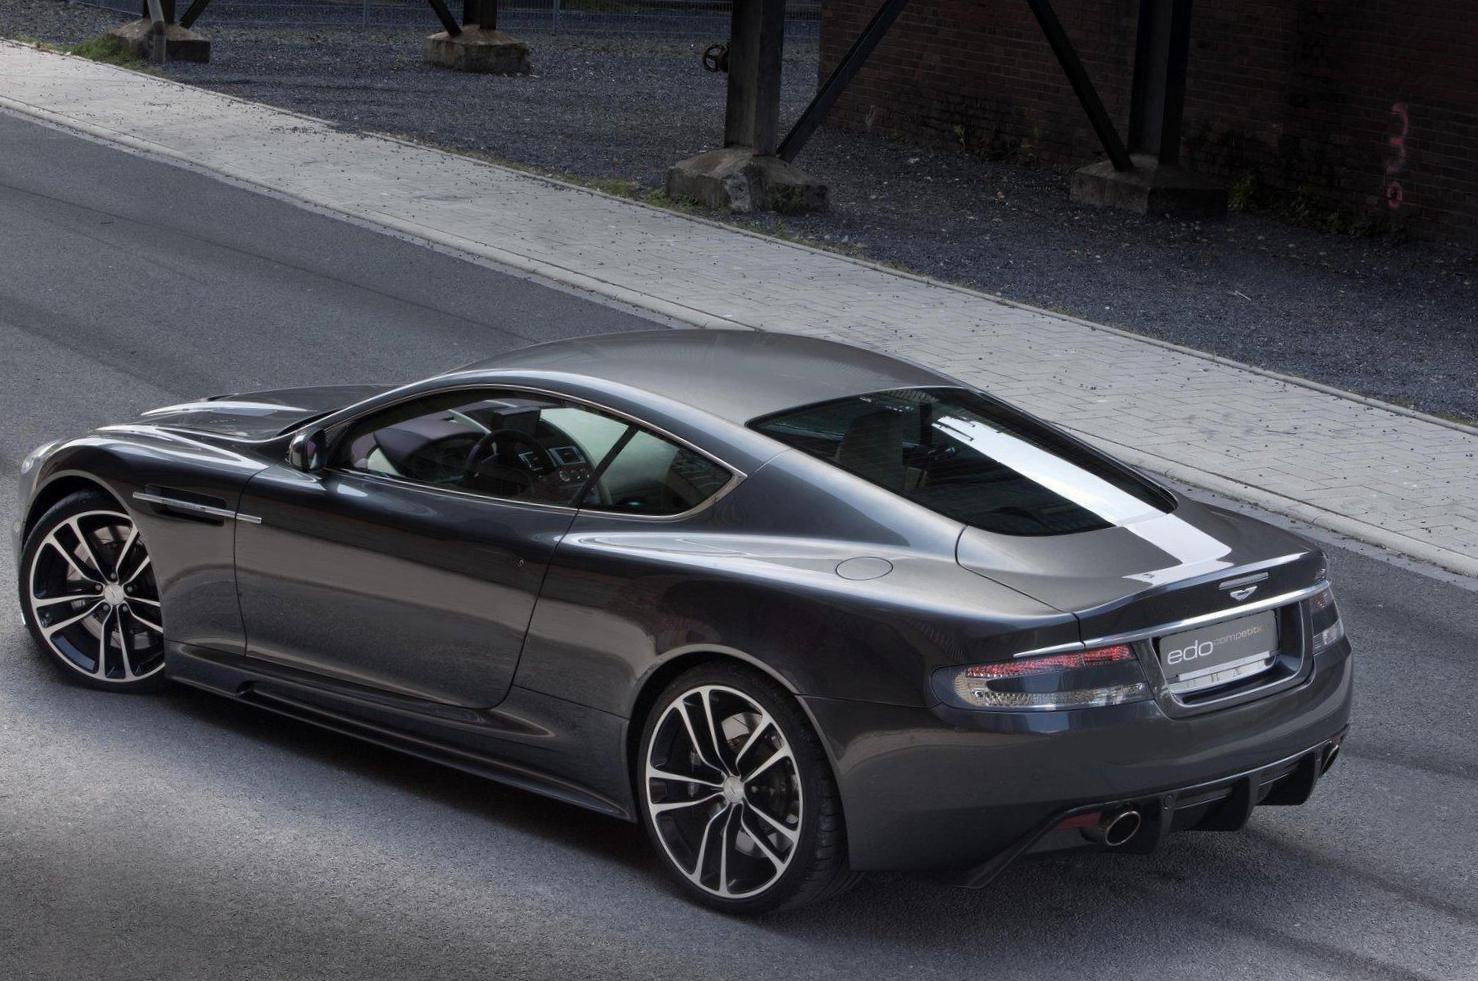 Aston Martin Db9 Photos And Specs Photo Aston Martin Db9 Prices And 26 Perfect Photos Of Aston Martin Db9